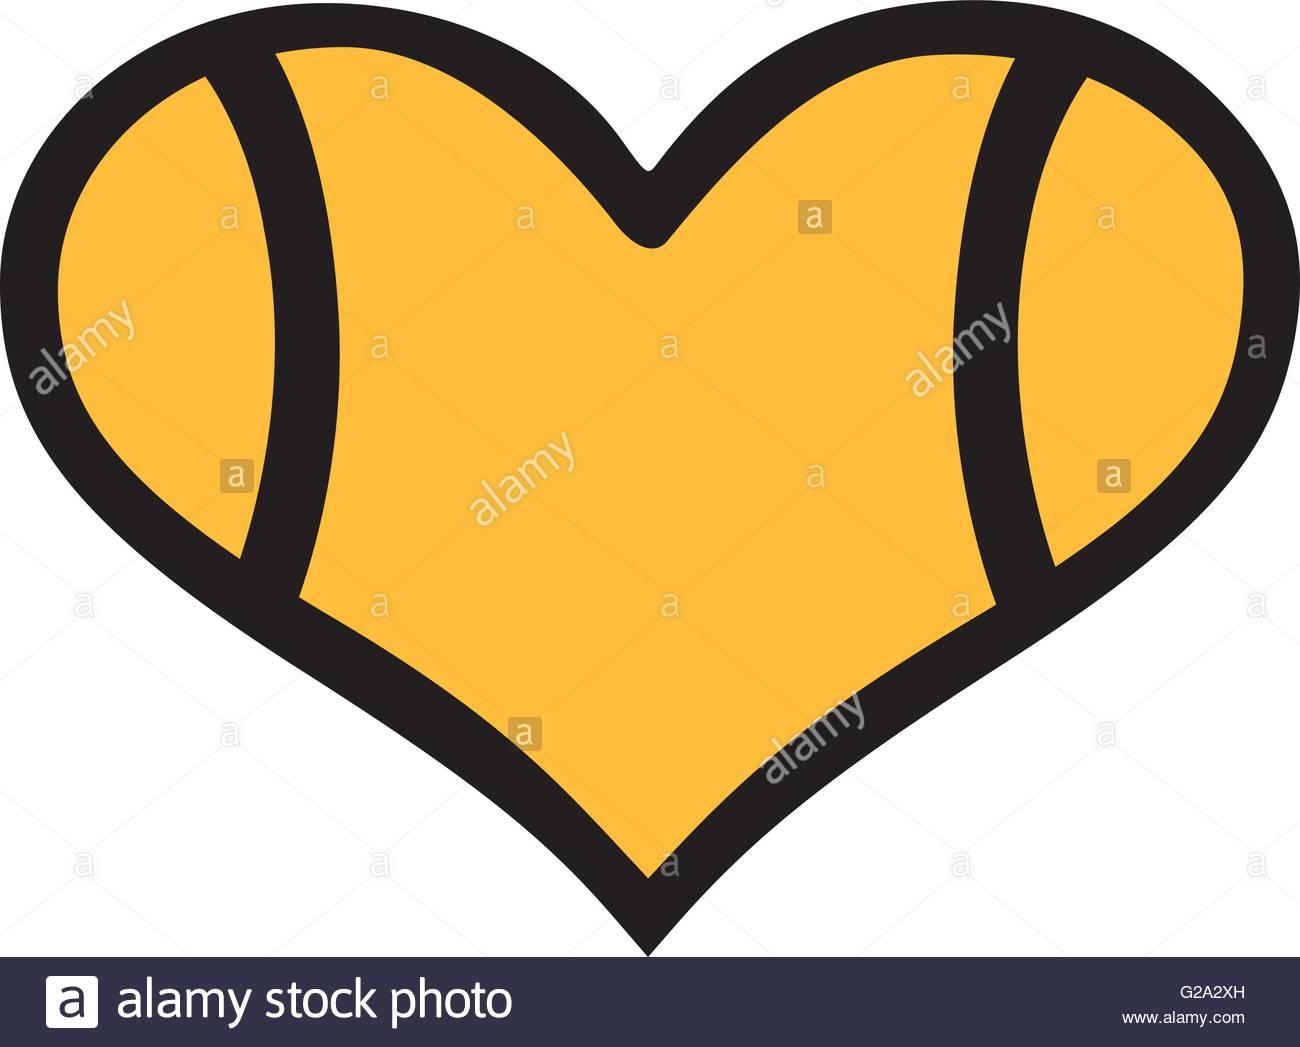 1300x1047 Tennis Ball Heart Stock Vector Art Amp Illustration, Vector Image